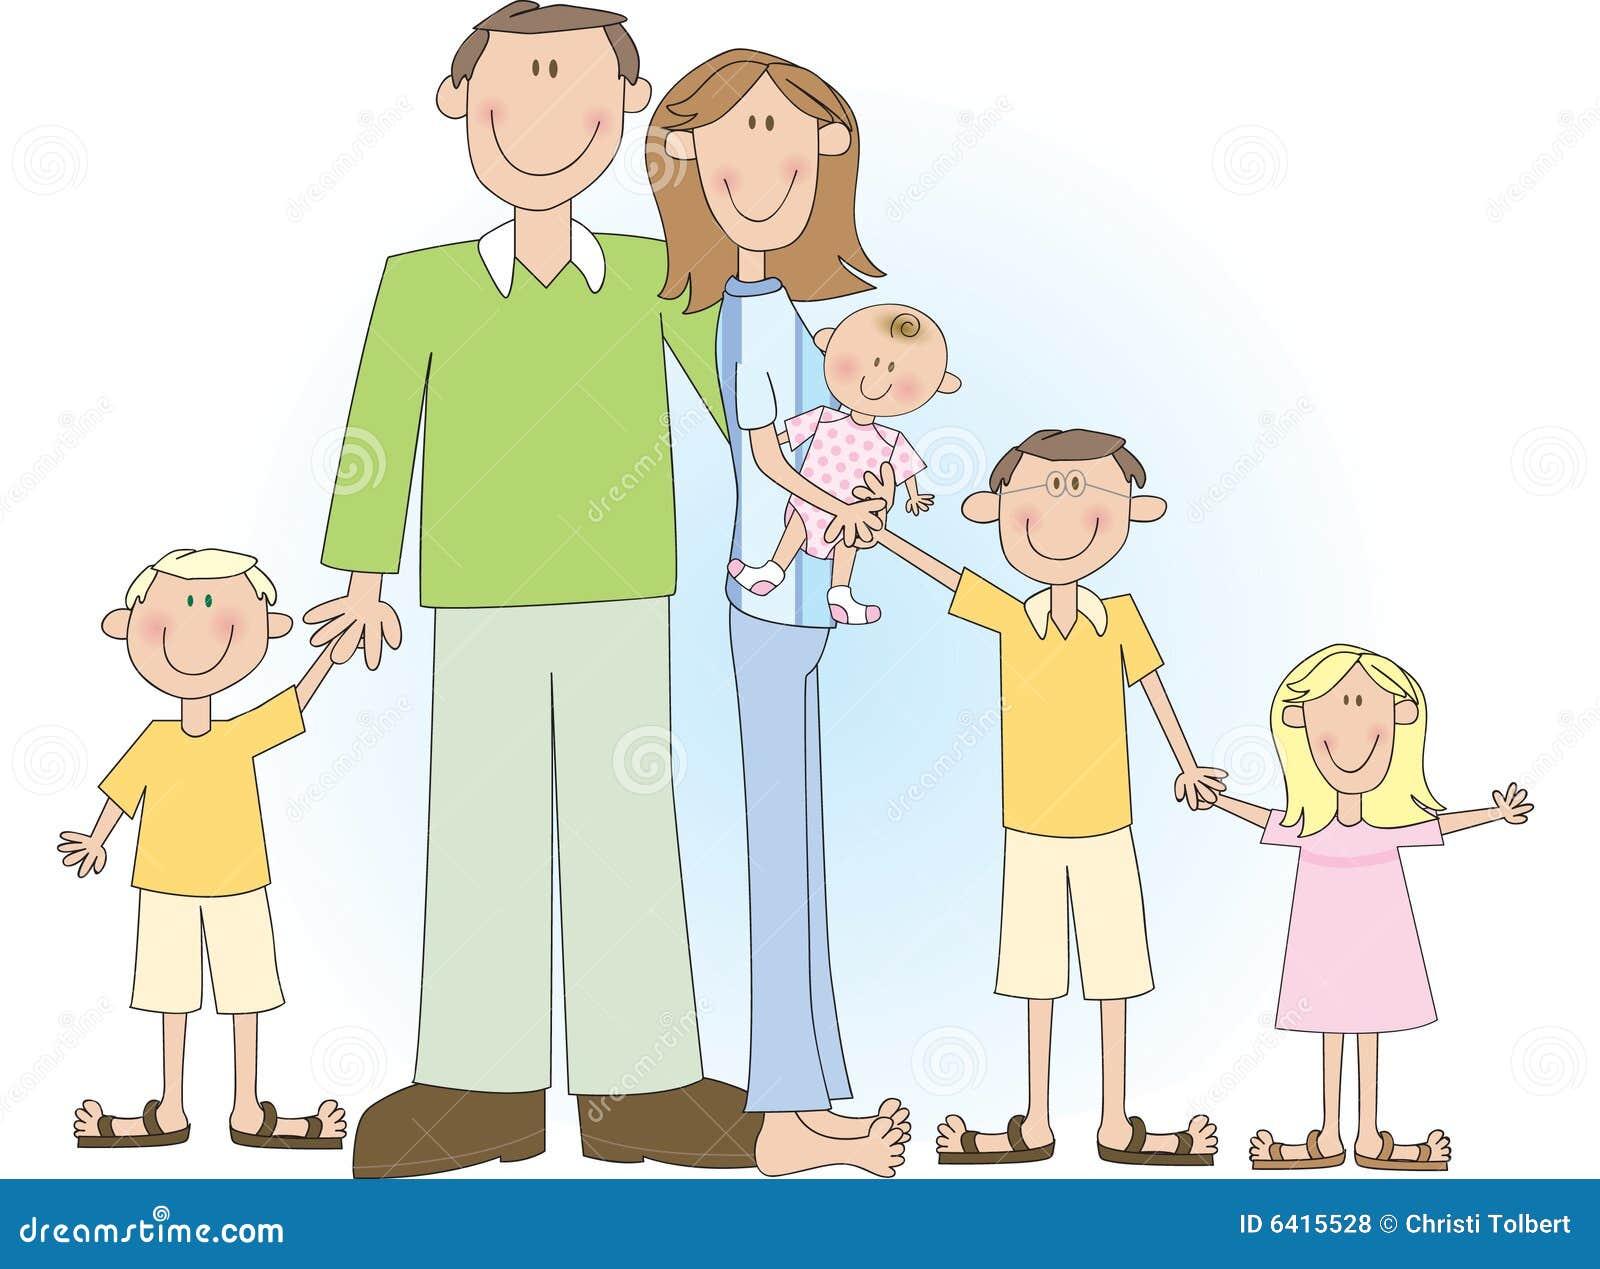 clipart big family - photo #18